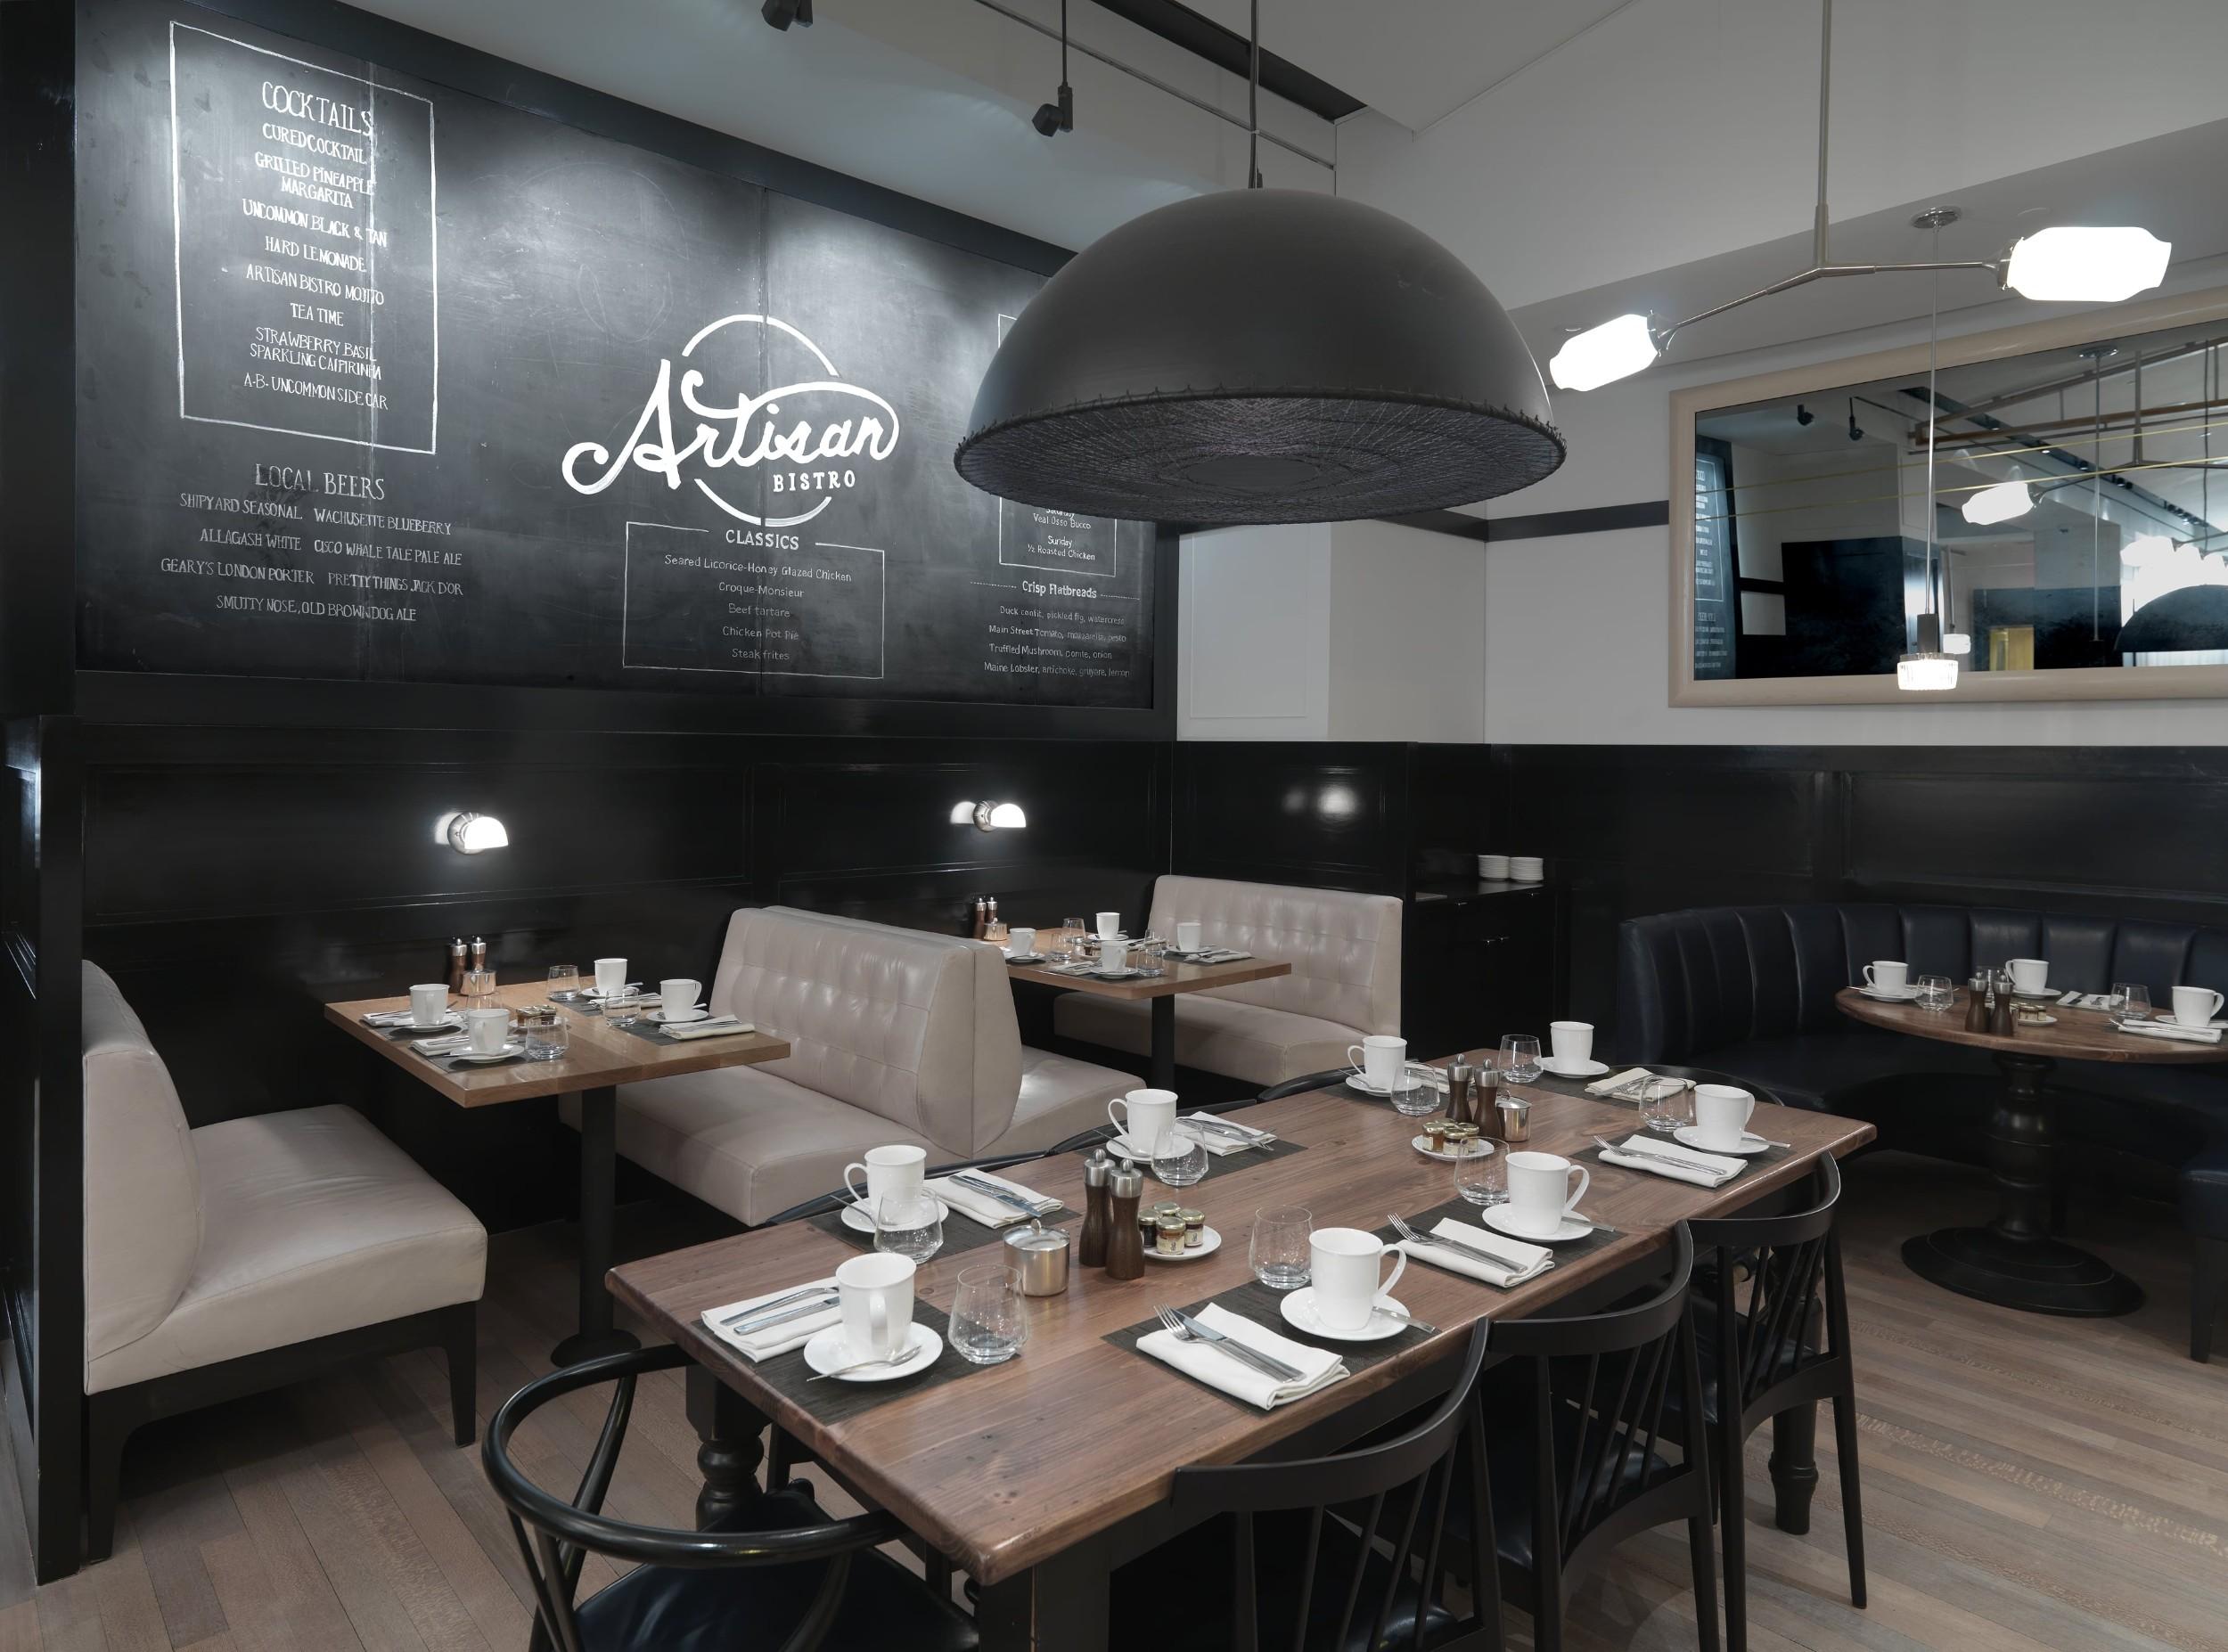 Ritz_Carlton_Artisan_Bistro_Restaurant.jpg